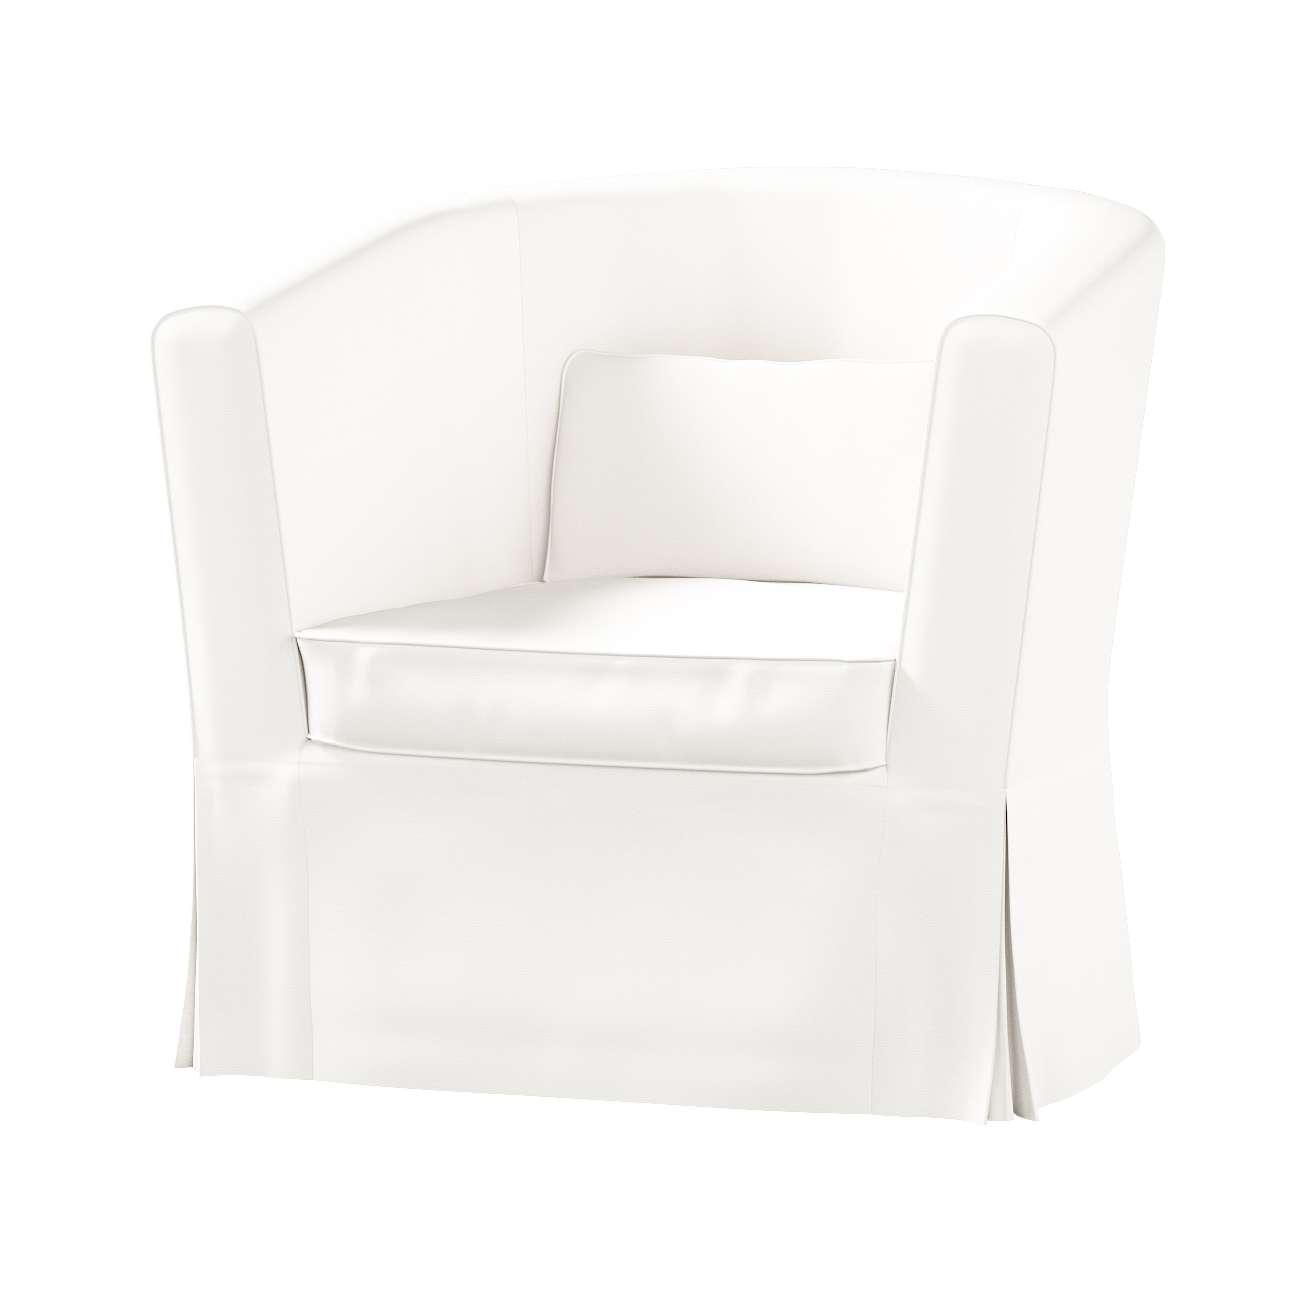 Potah na křeslo IKEA Ektorp Tullsta v kolekci Cotton Panama, látka: 702-34